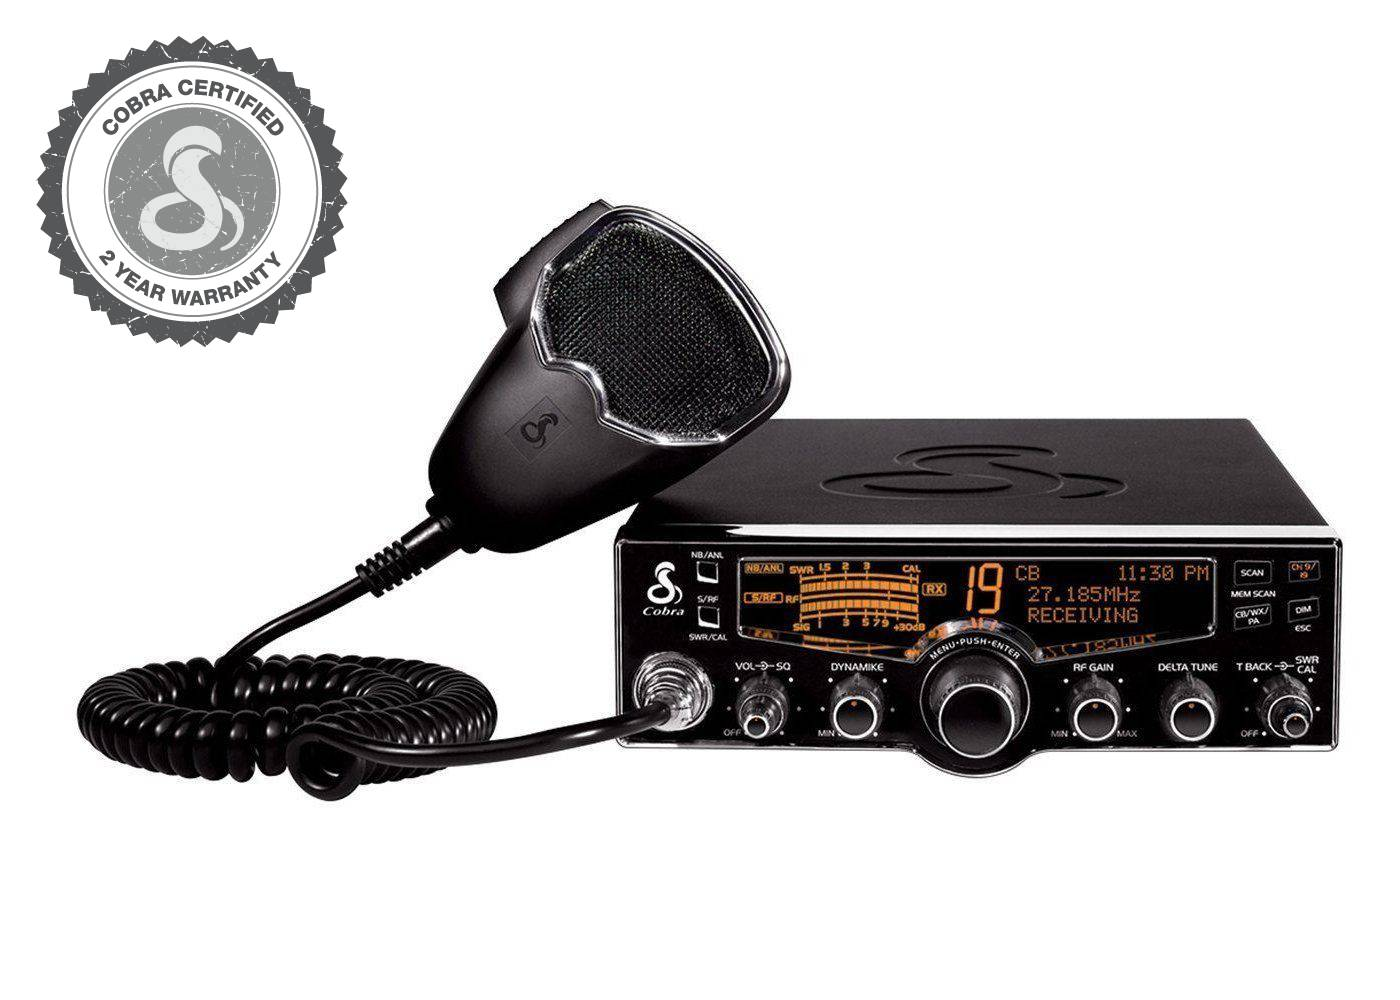 Cobra 29 LX (Open Box) Professional CB Radio